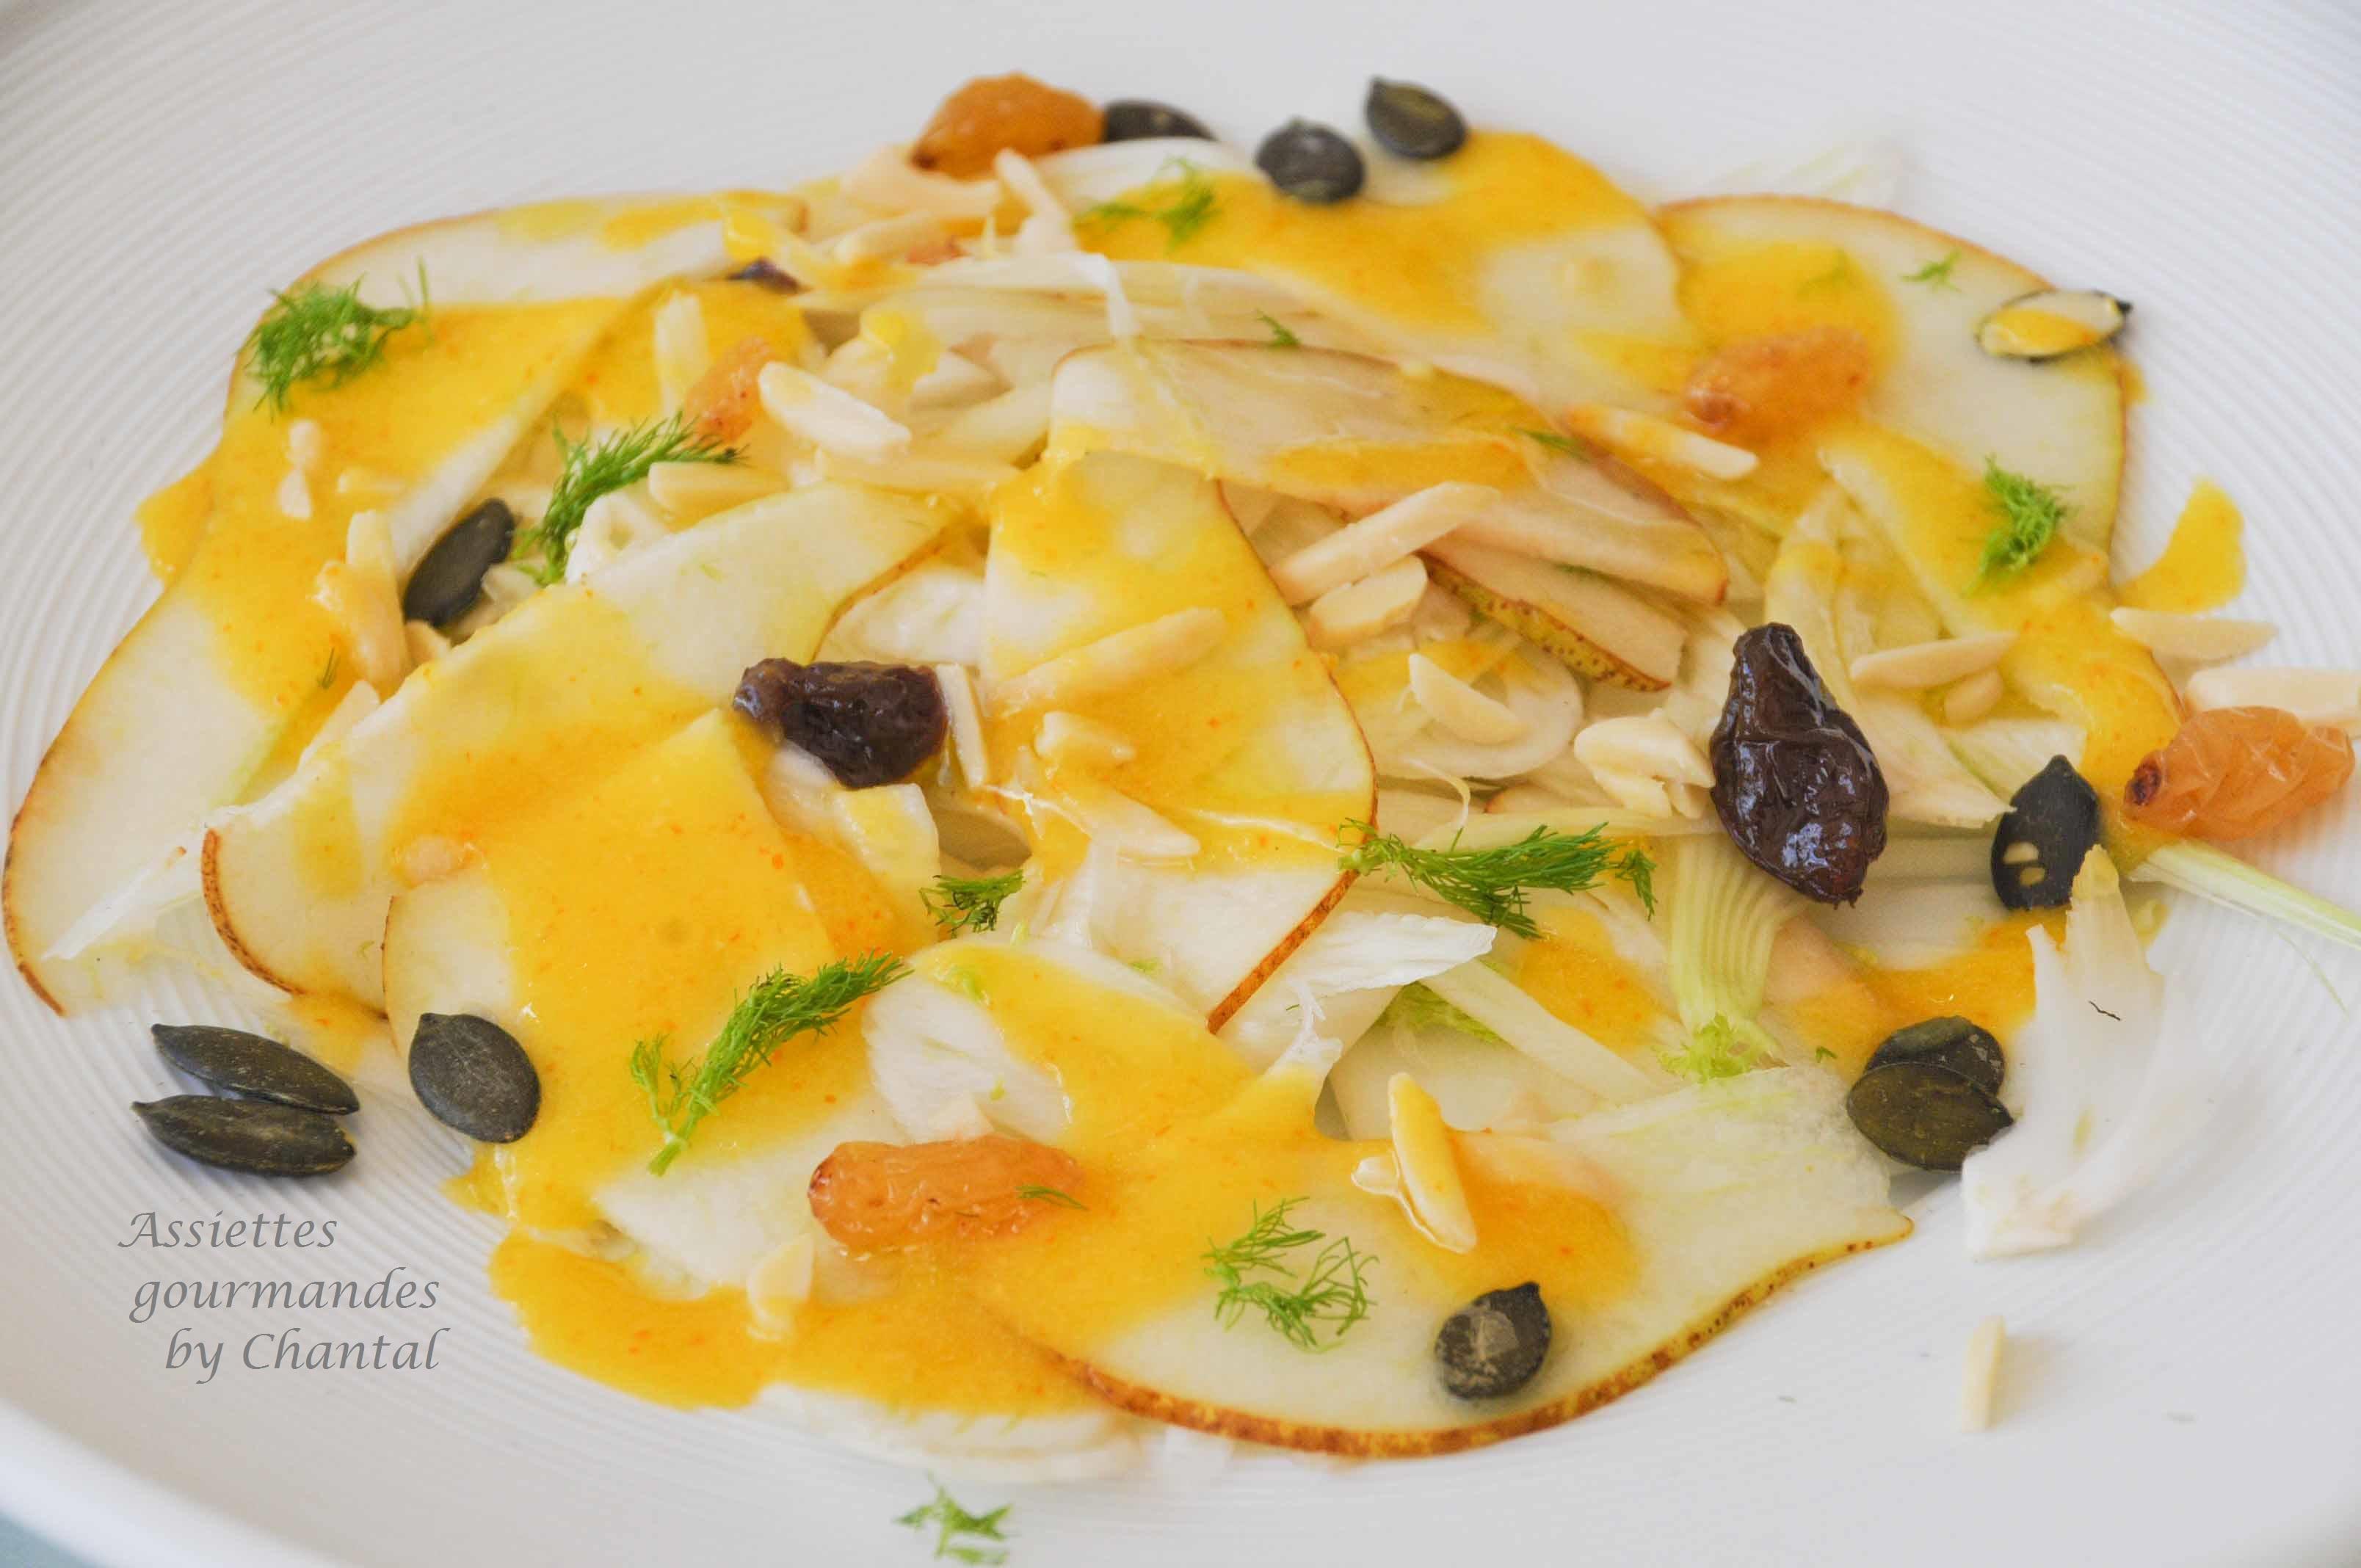 salade fenouil poires vinaigrette la mangue. Black Bedroom Furniture Sets. Home Design Ideas